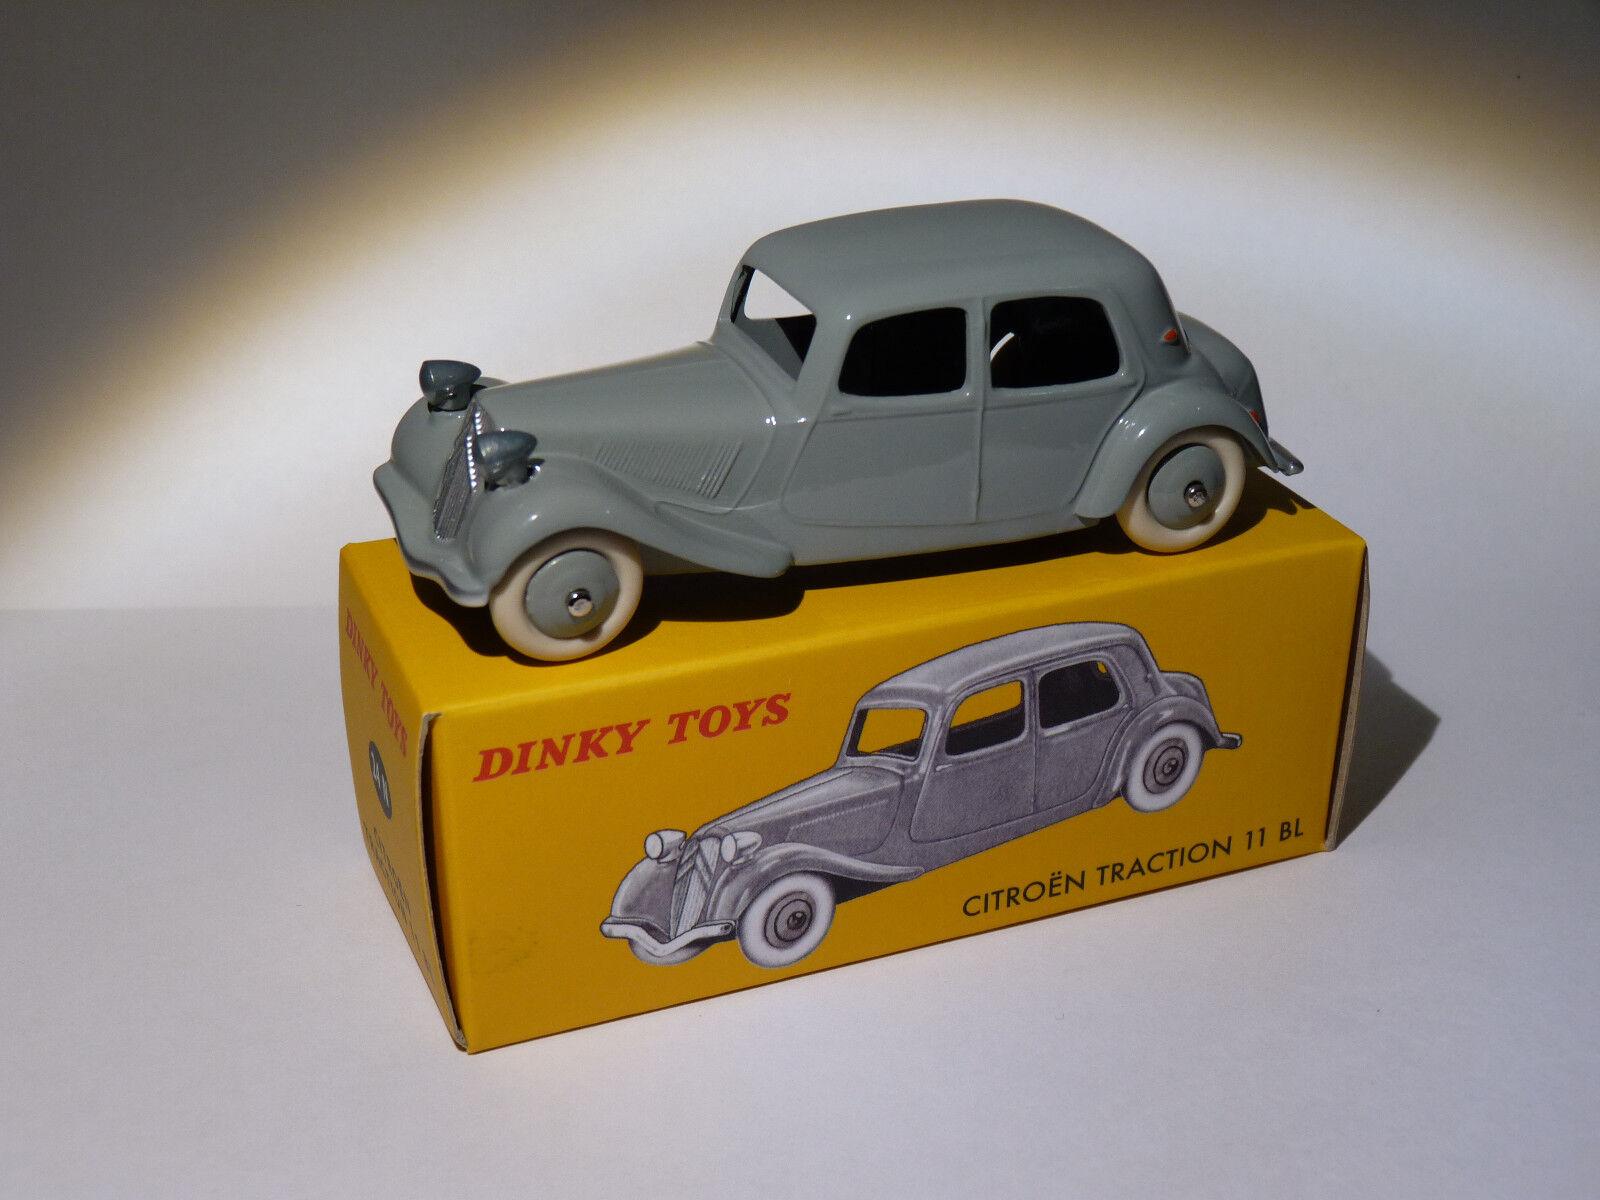 Rara Citroen Trazione Bl  Ref 24N Edizione Natale 2010 a 143 di Dinky giocattoli